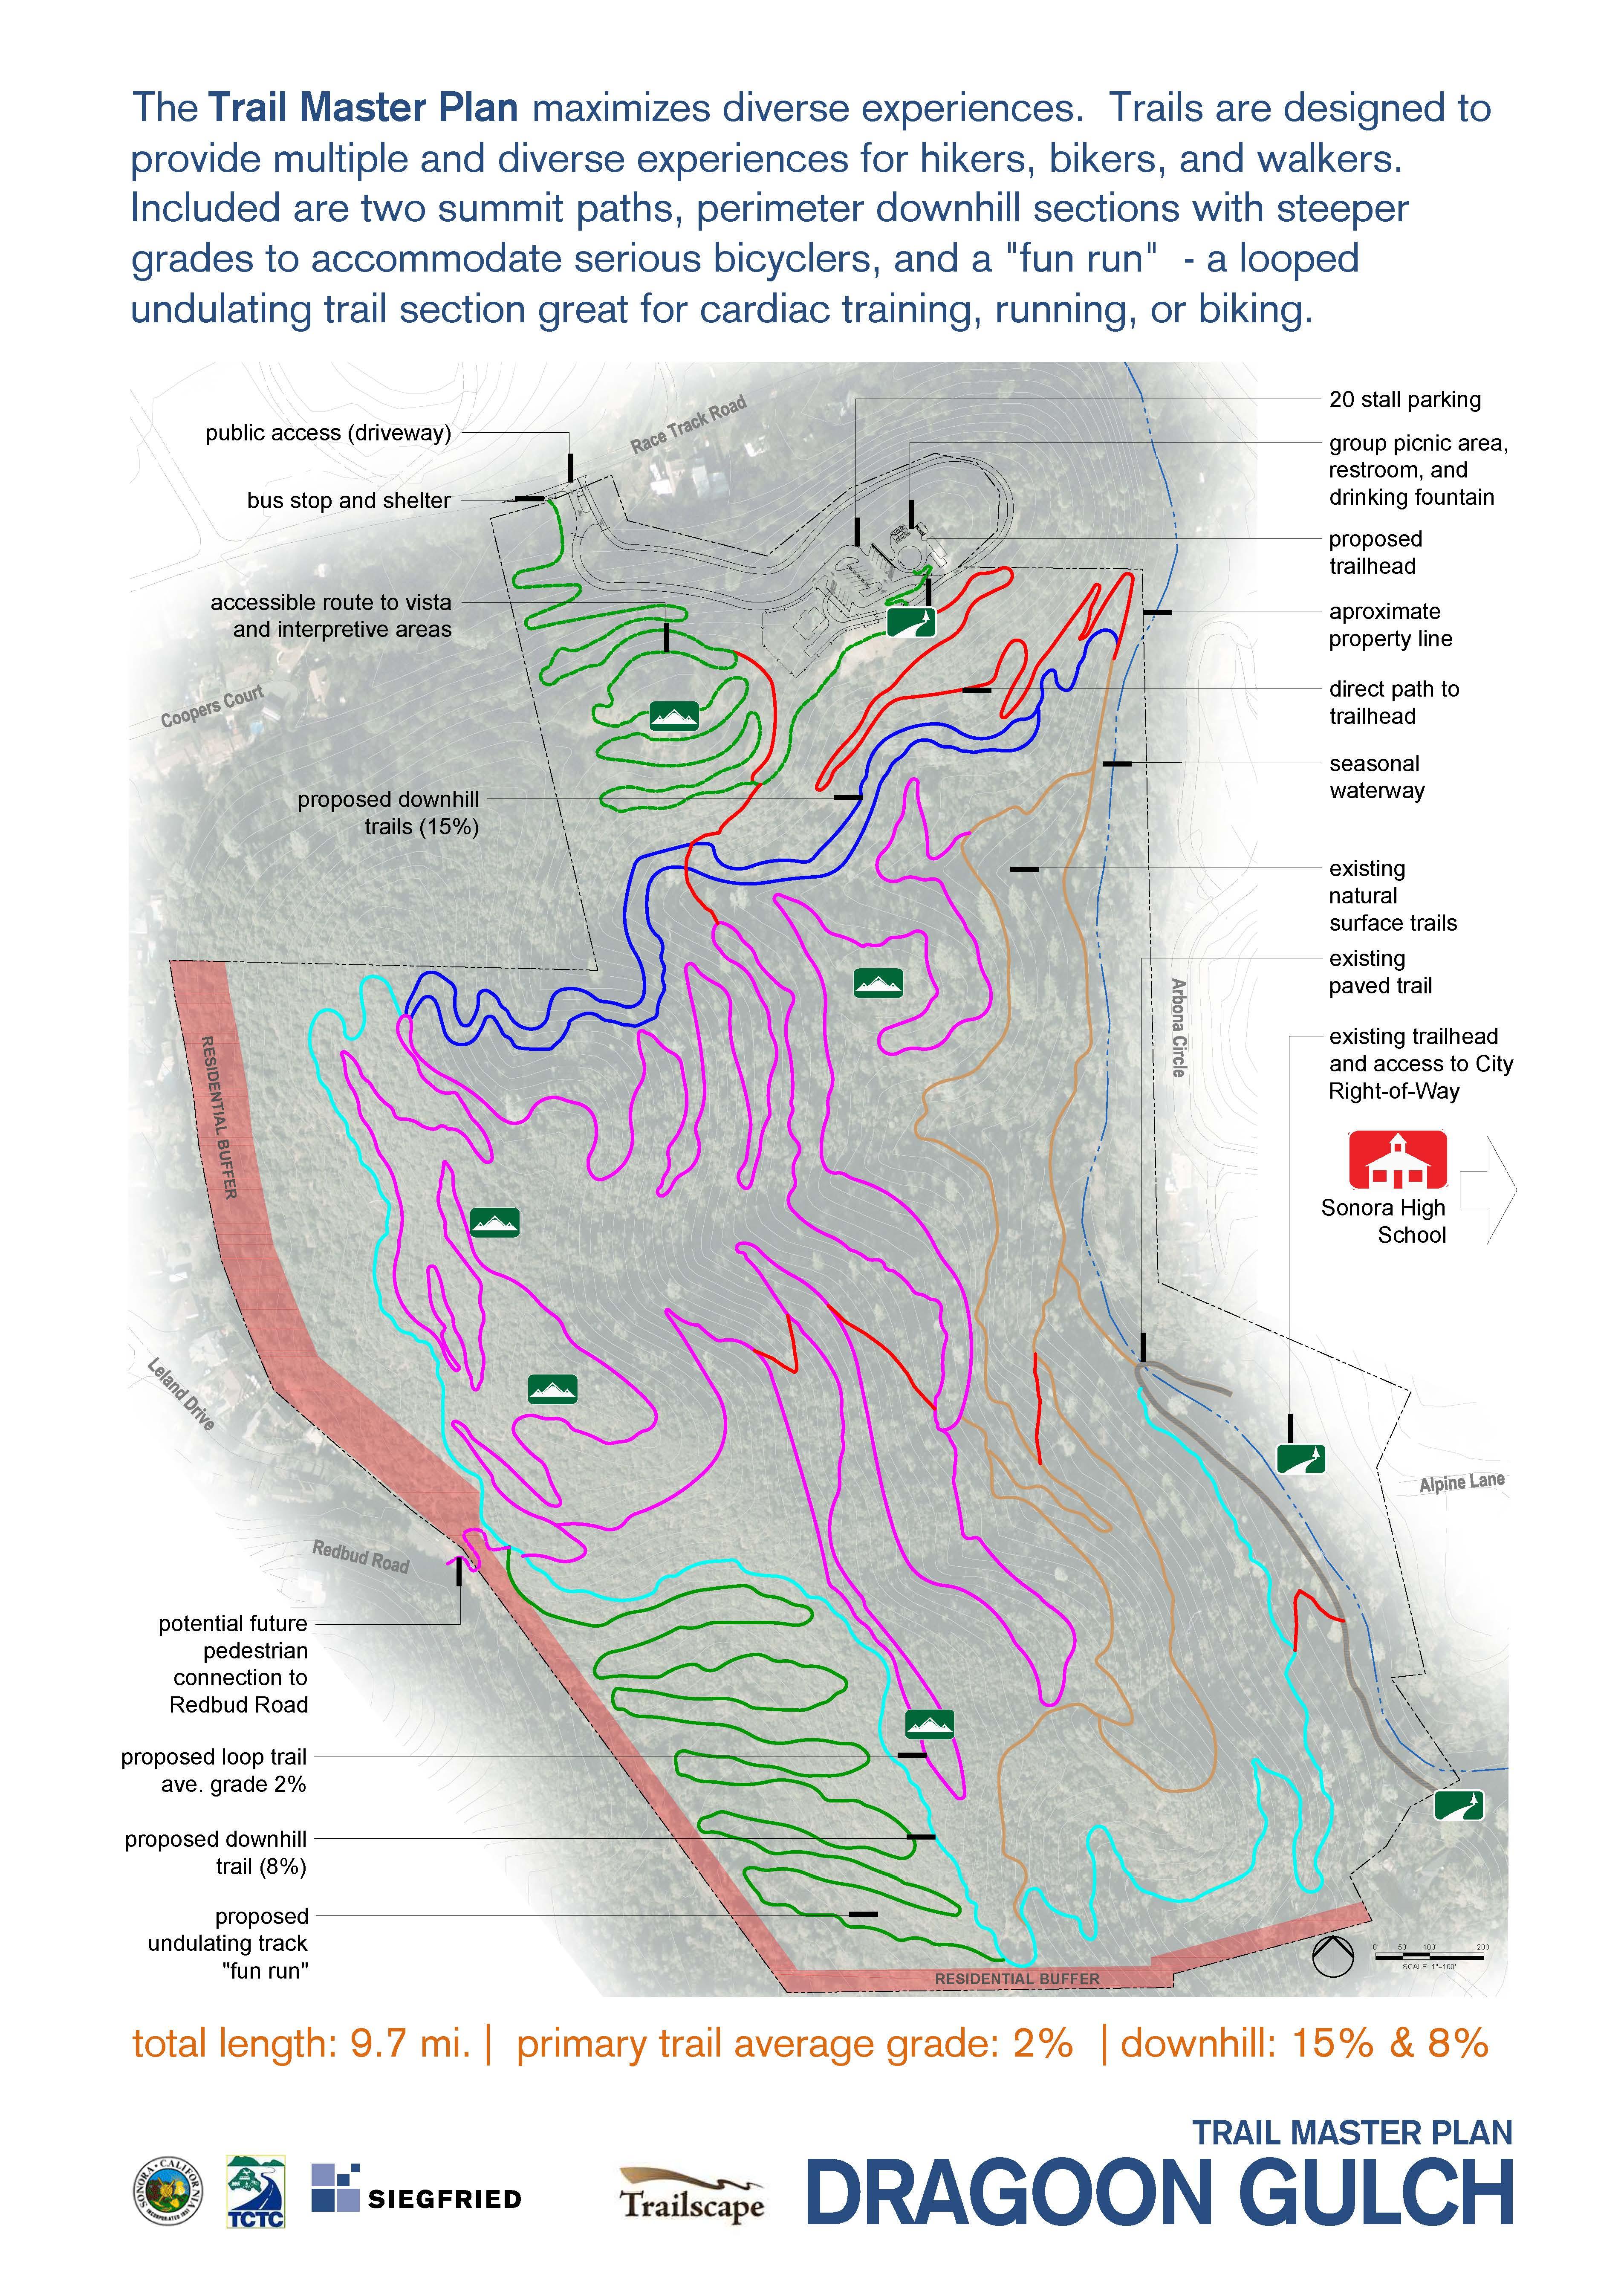 Dragoon Gulch Master Trail Plan | TCTC on